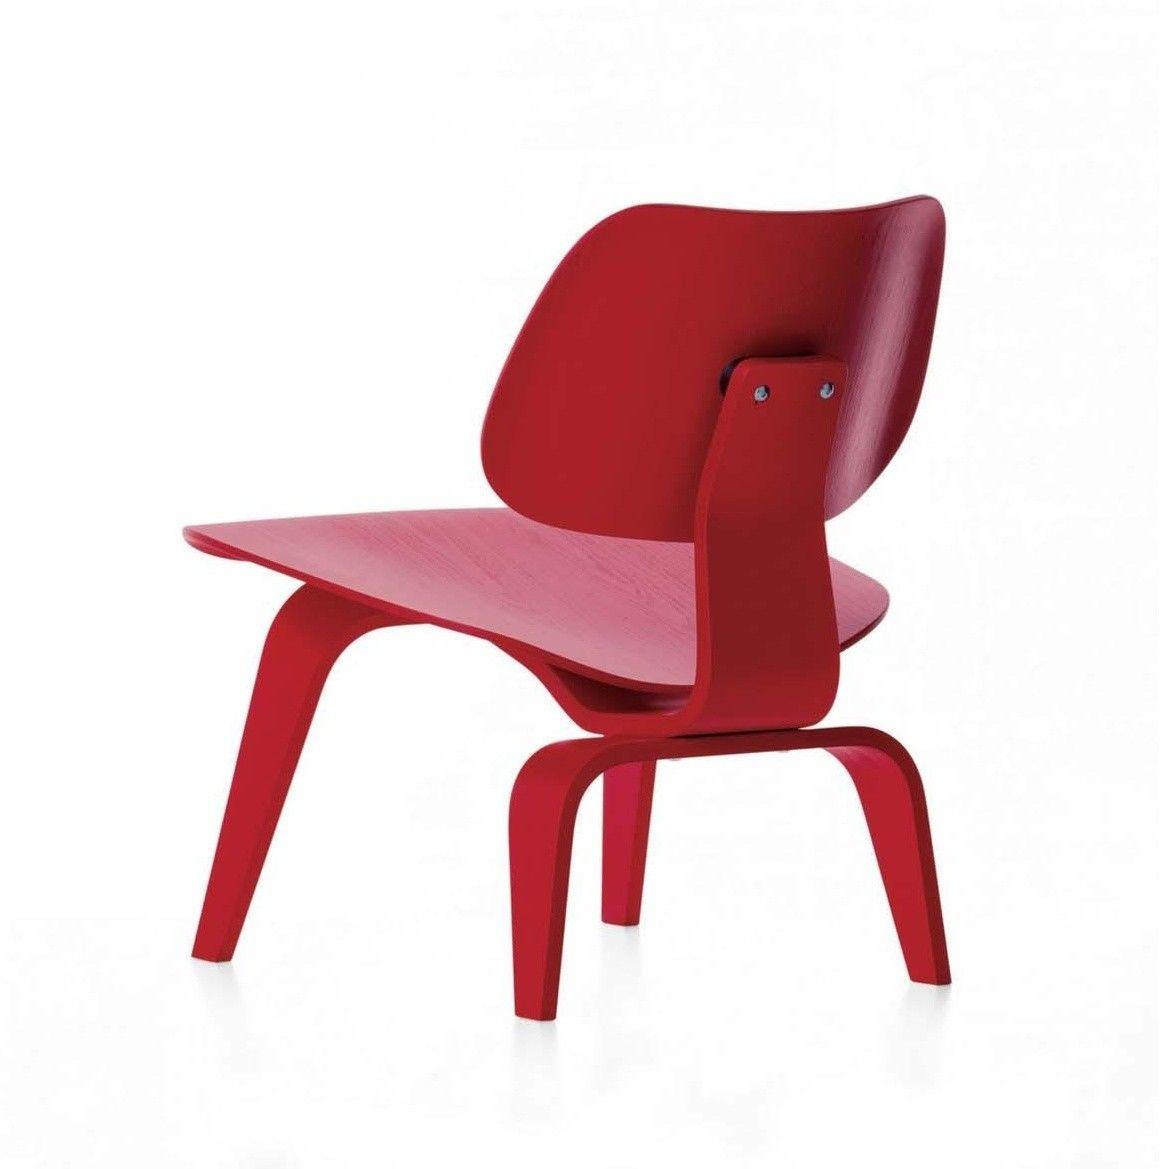 lcw stuhl vitra. Black Bedroom Furniture Sets. Home Design Ideas